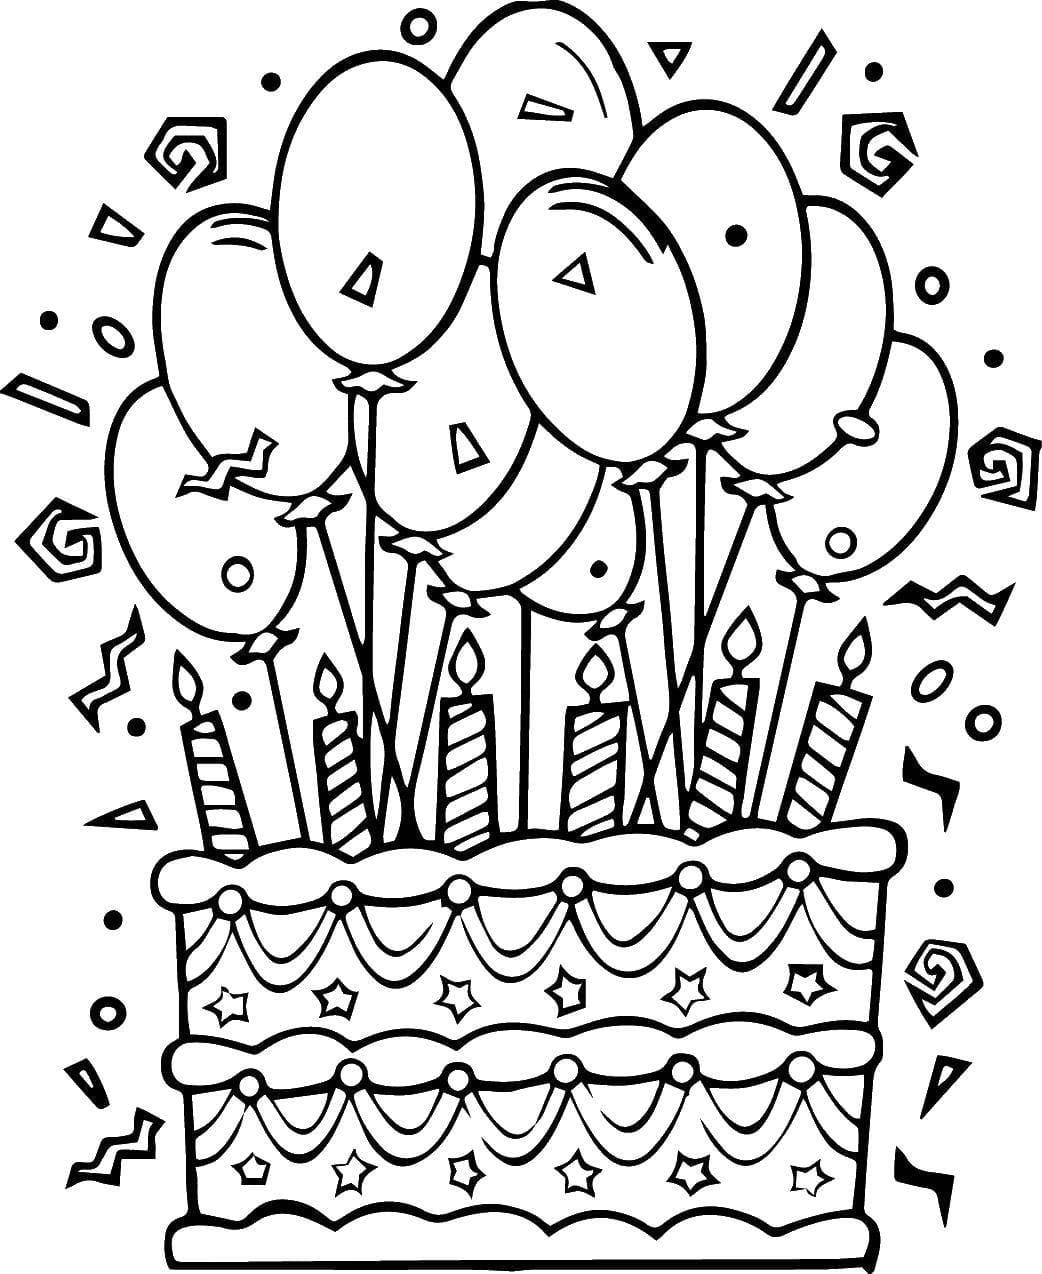 Онлайн, шаблон открытки с днем рождения черно белый